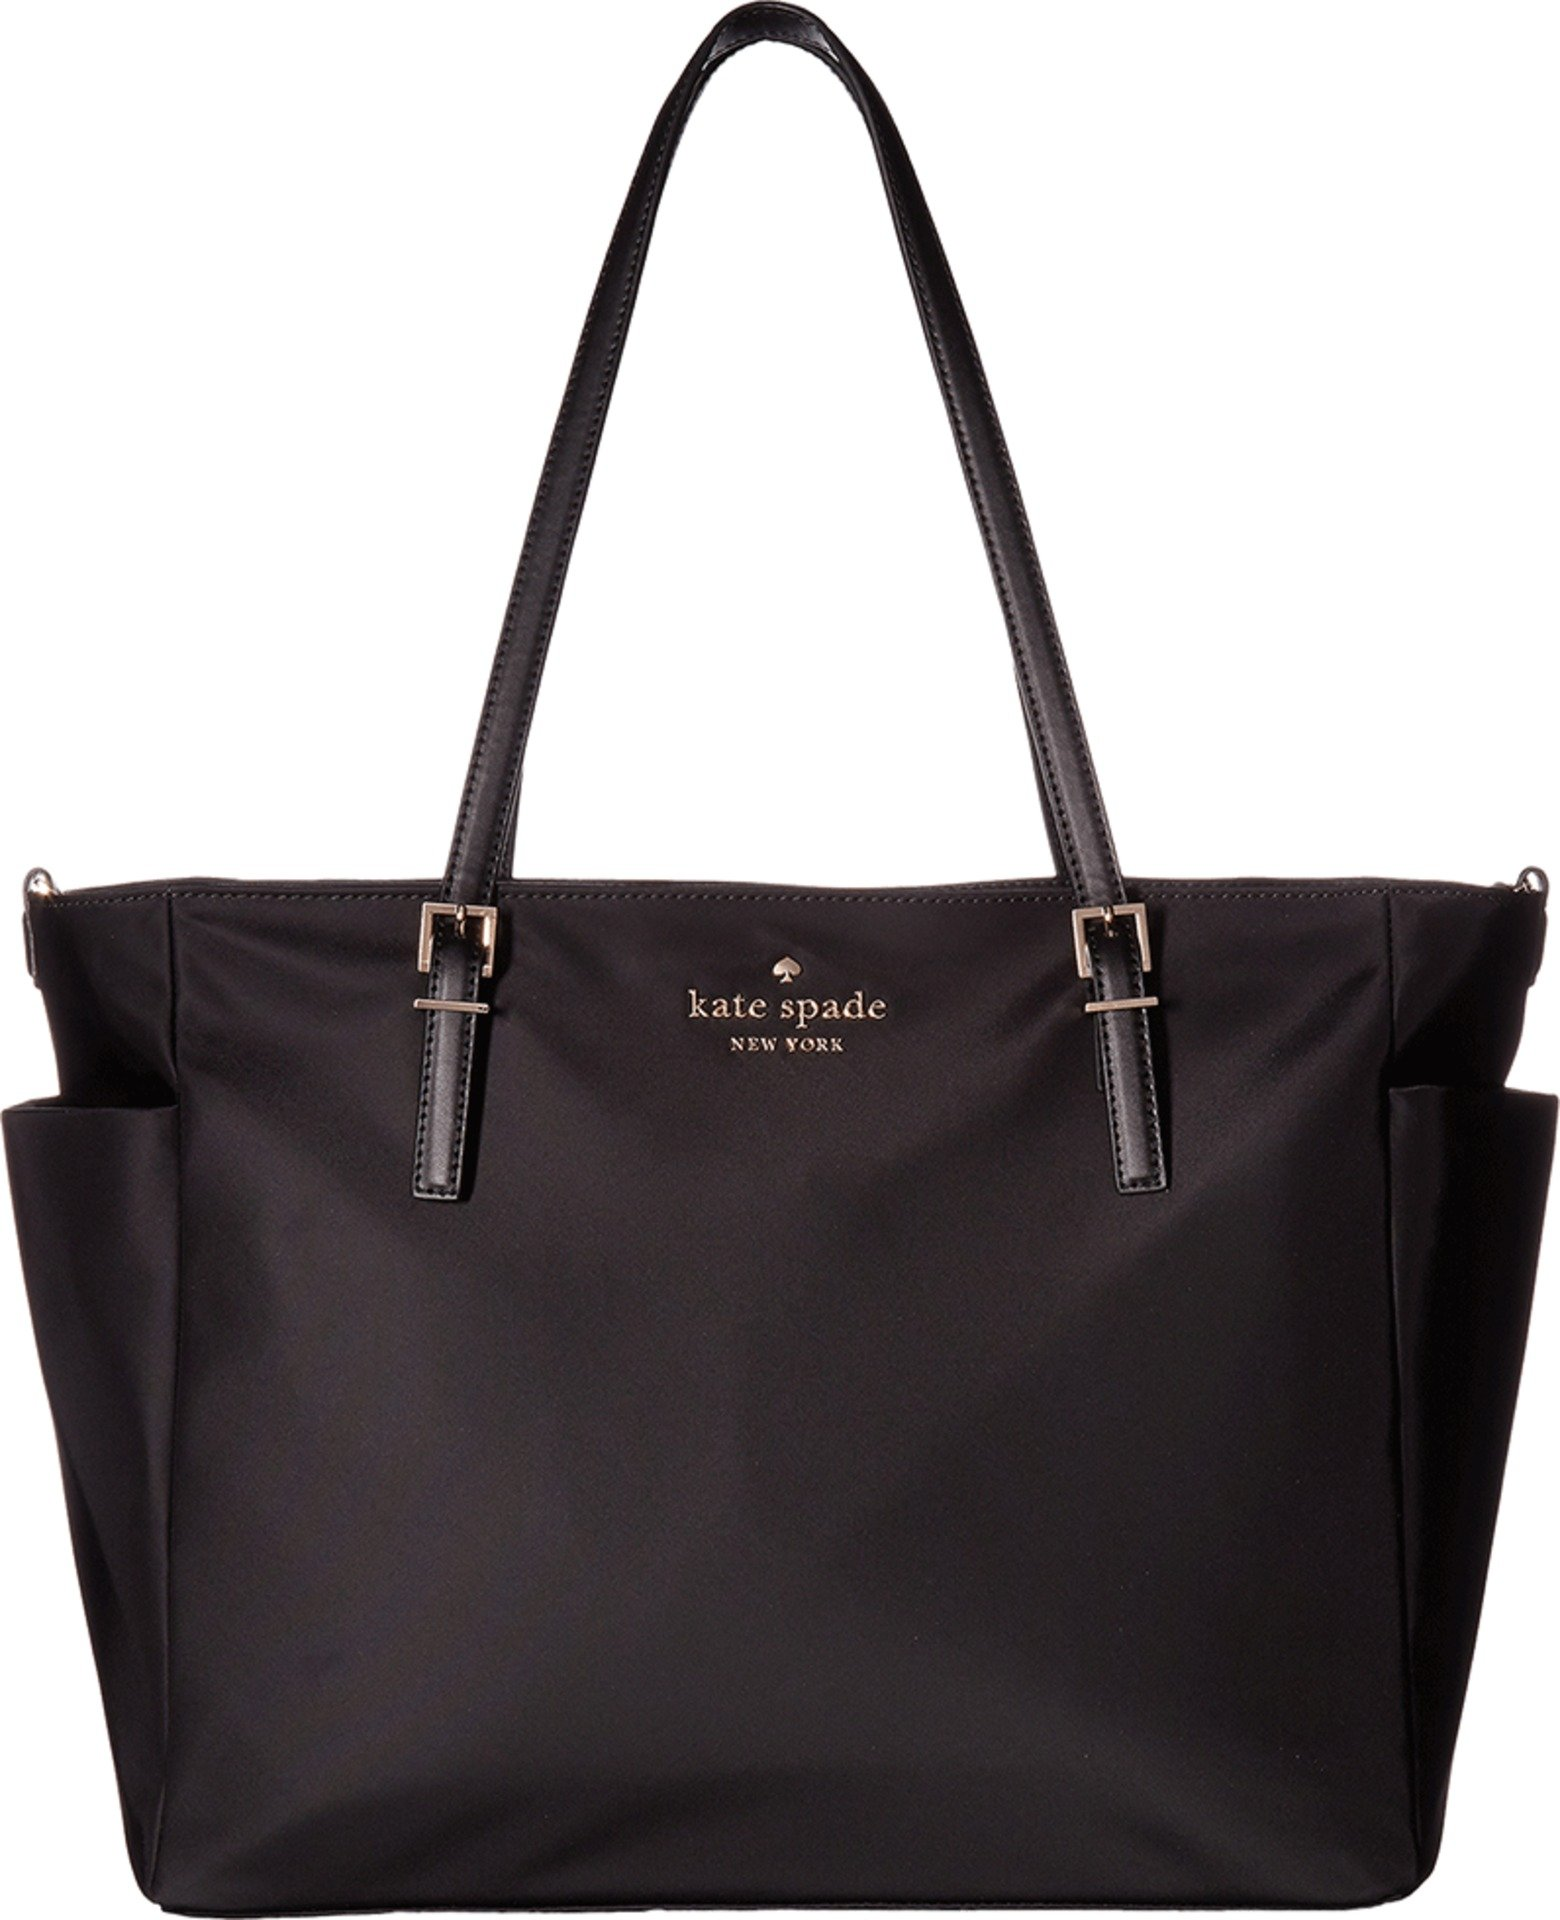 Kate Spade New York Women's Watson Lane Bethany Baby Bag Black Handbag